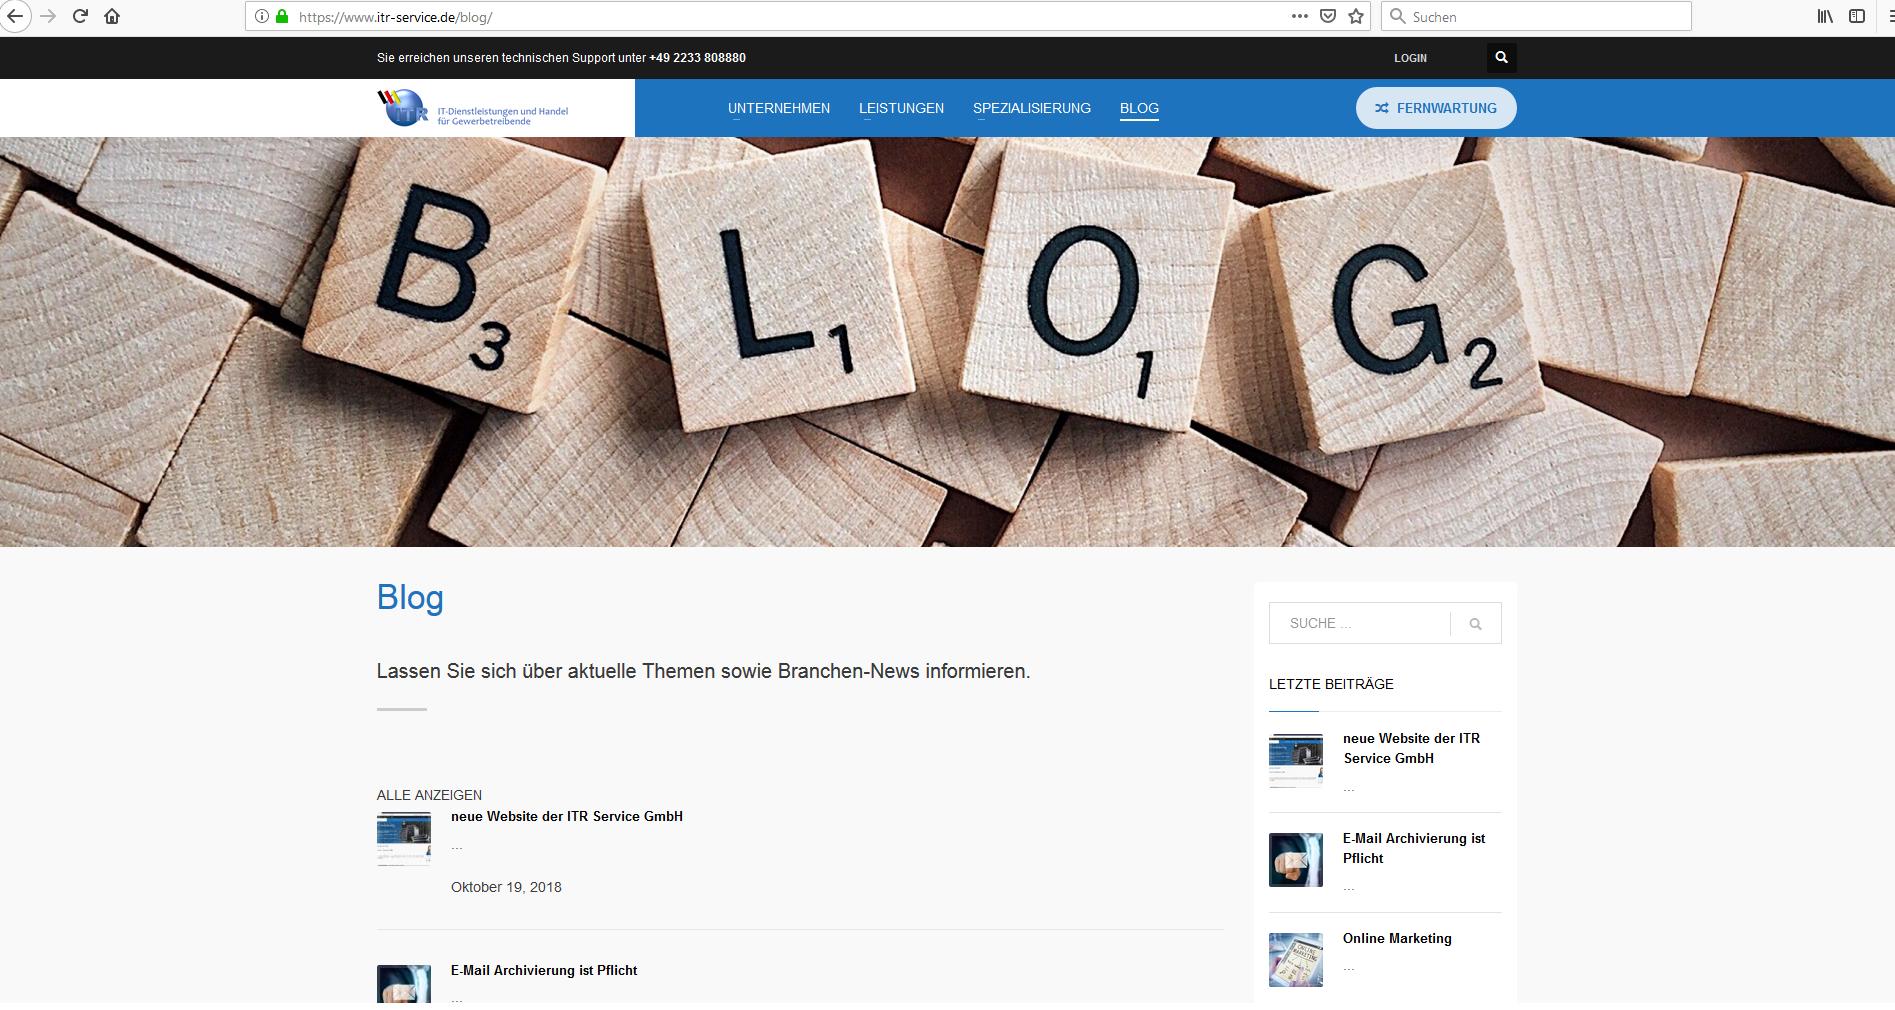 ITR Service GmbH Website - Blog